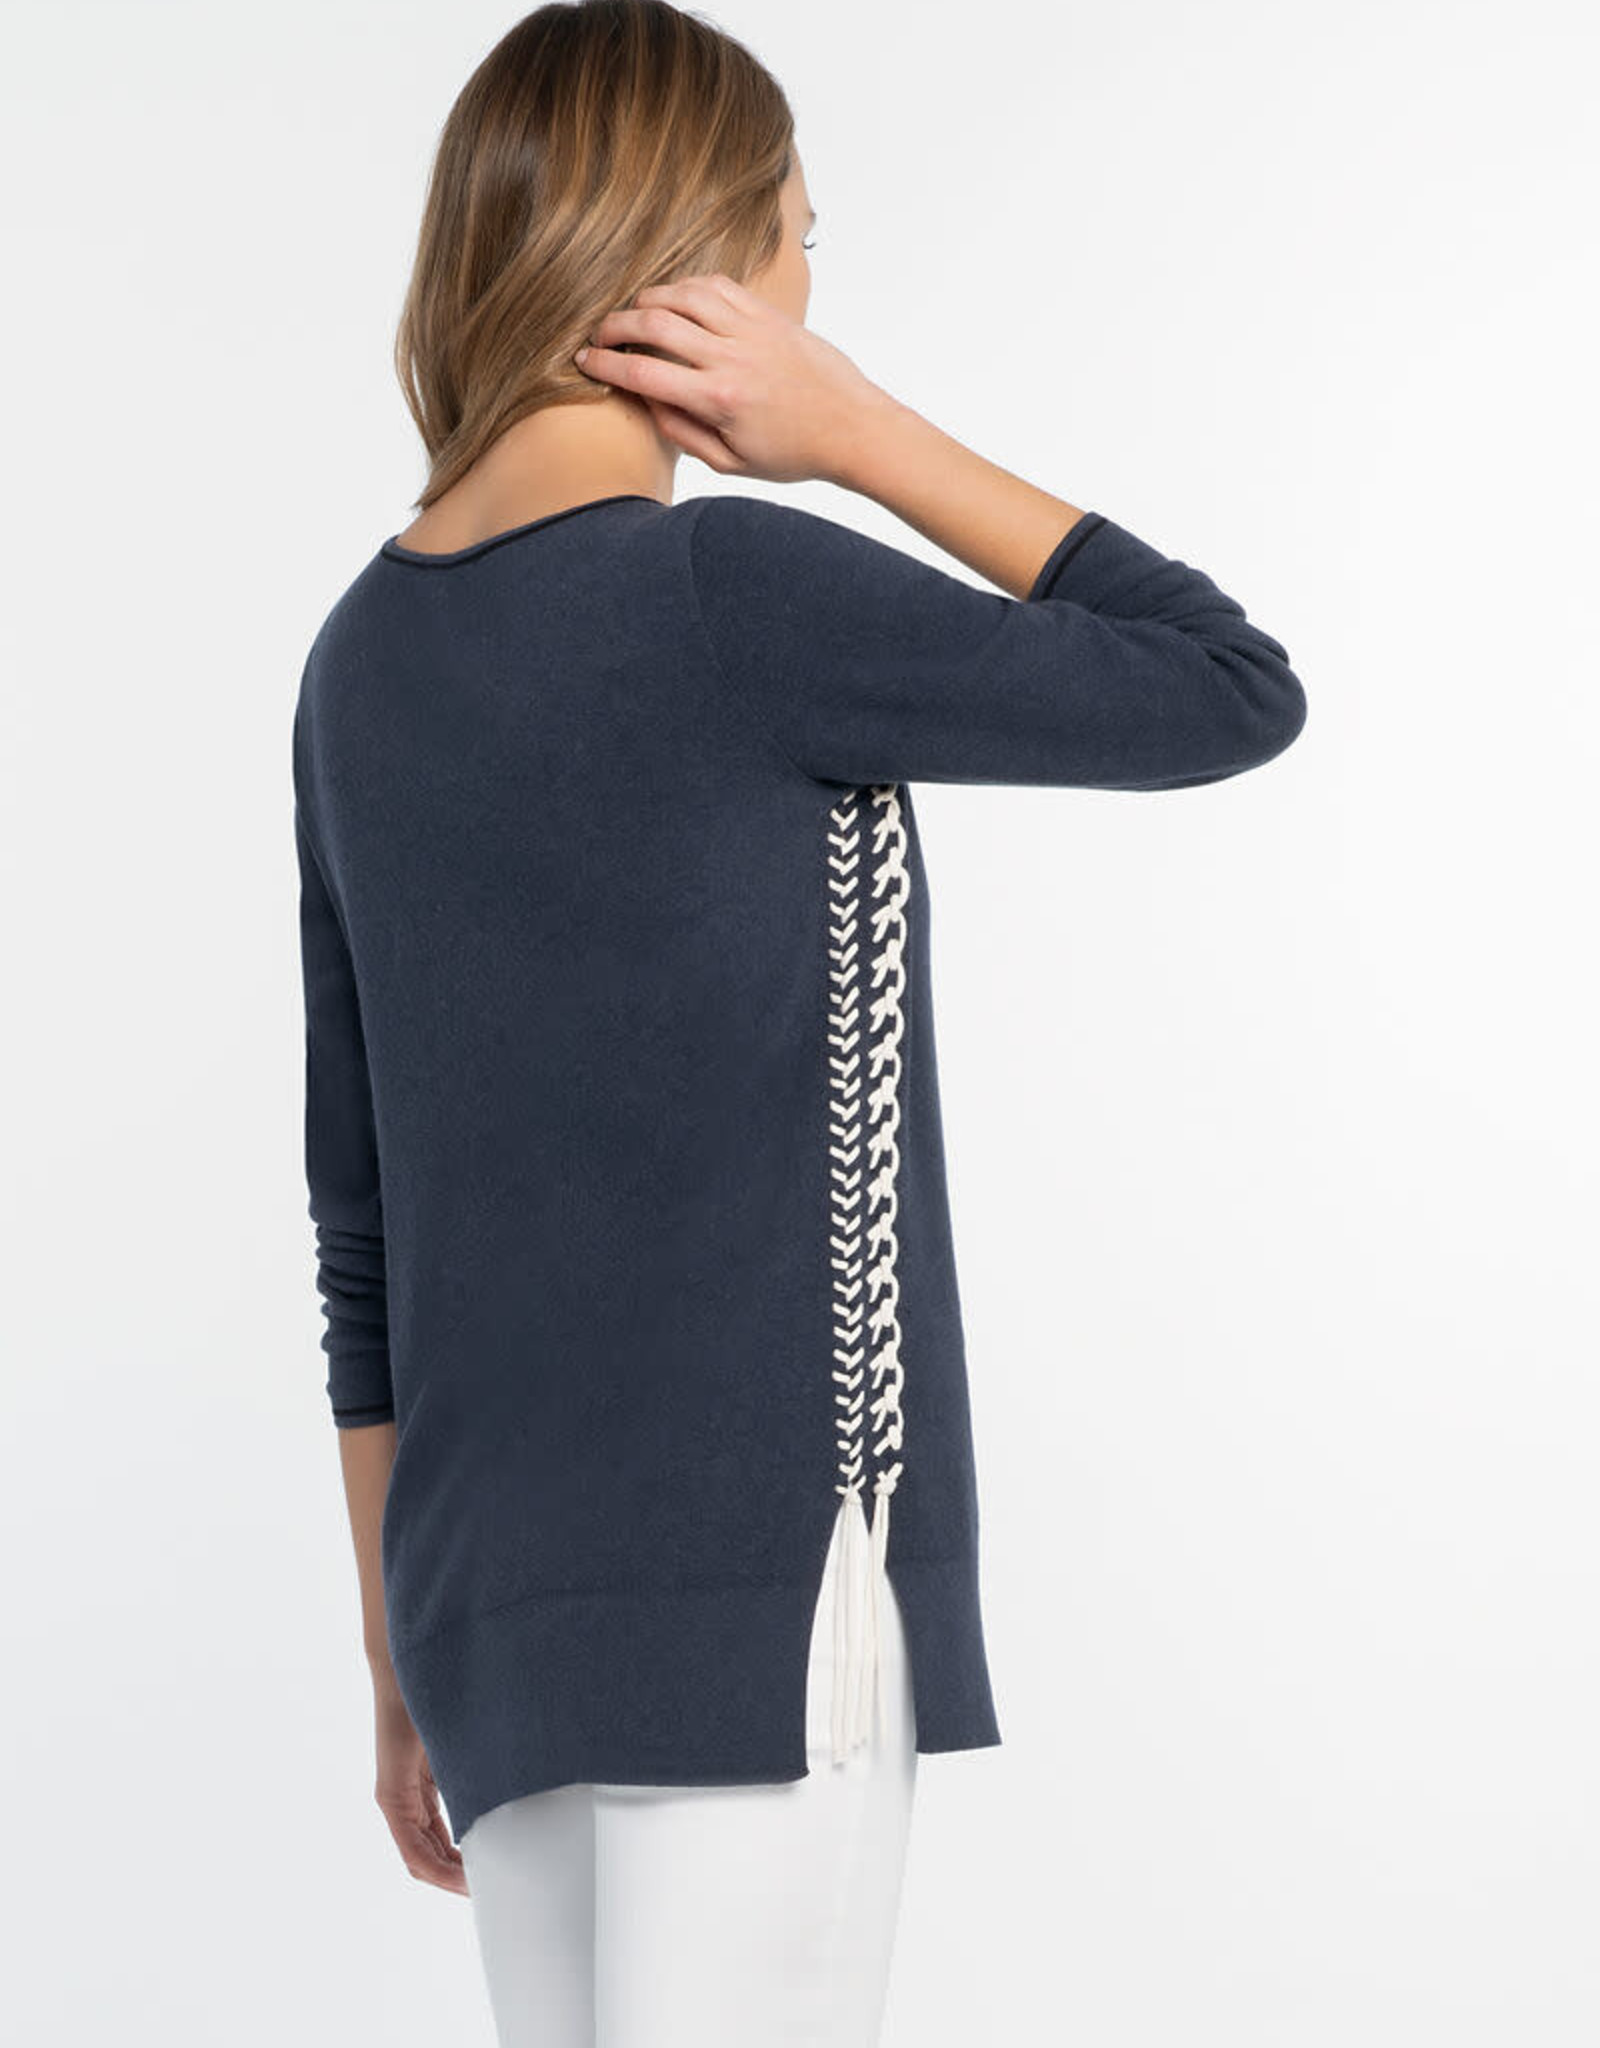 Nic & Zoe On My Side Sweater